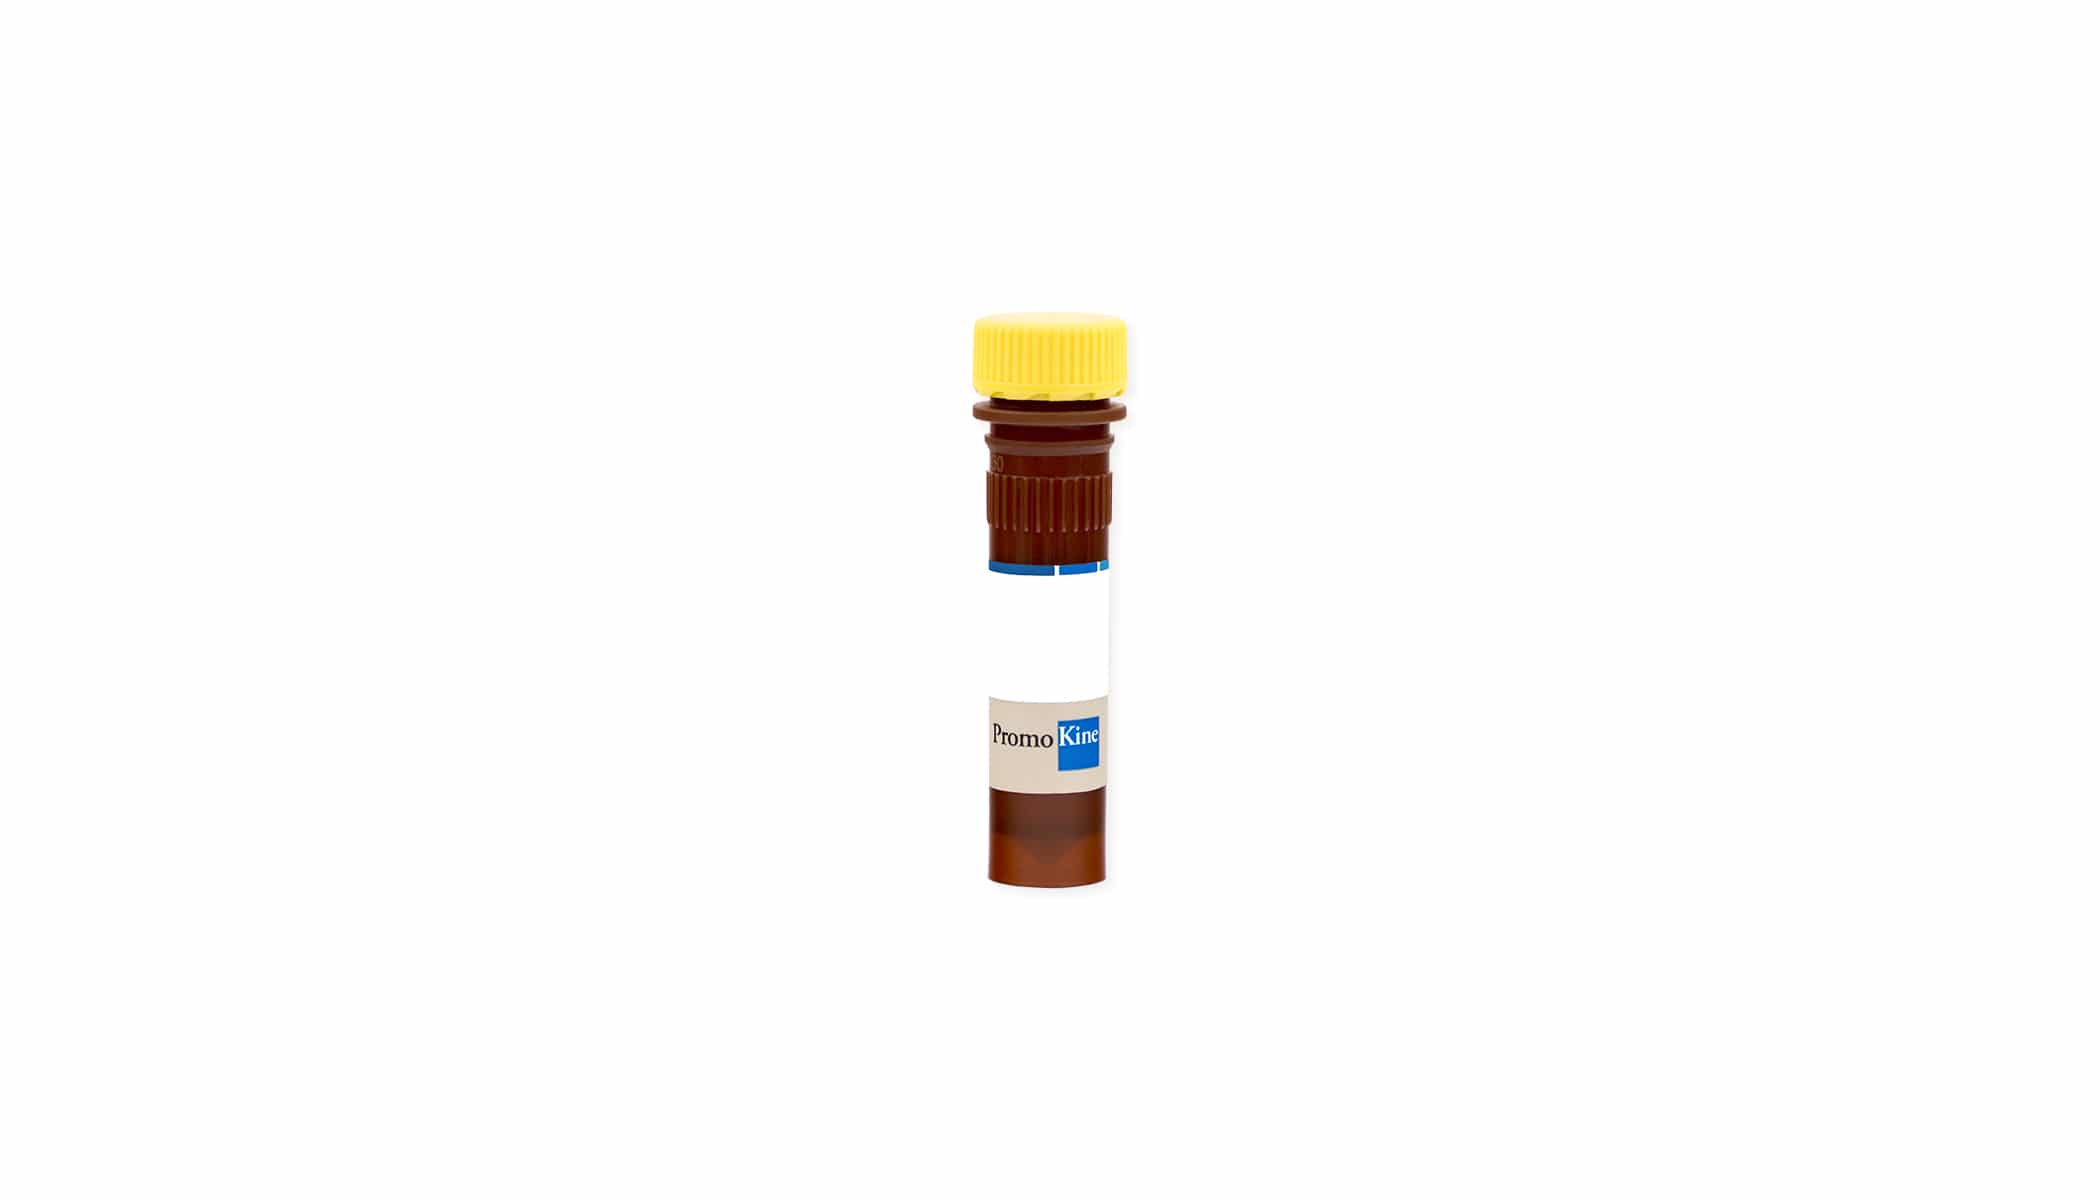 Biotin-VDVAD-FMK (10 mM)